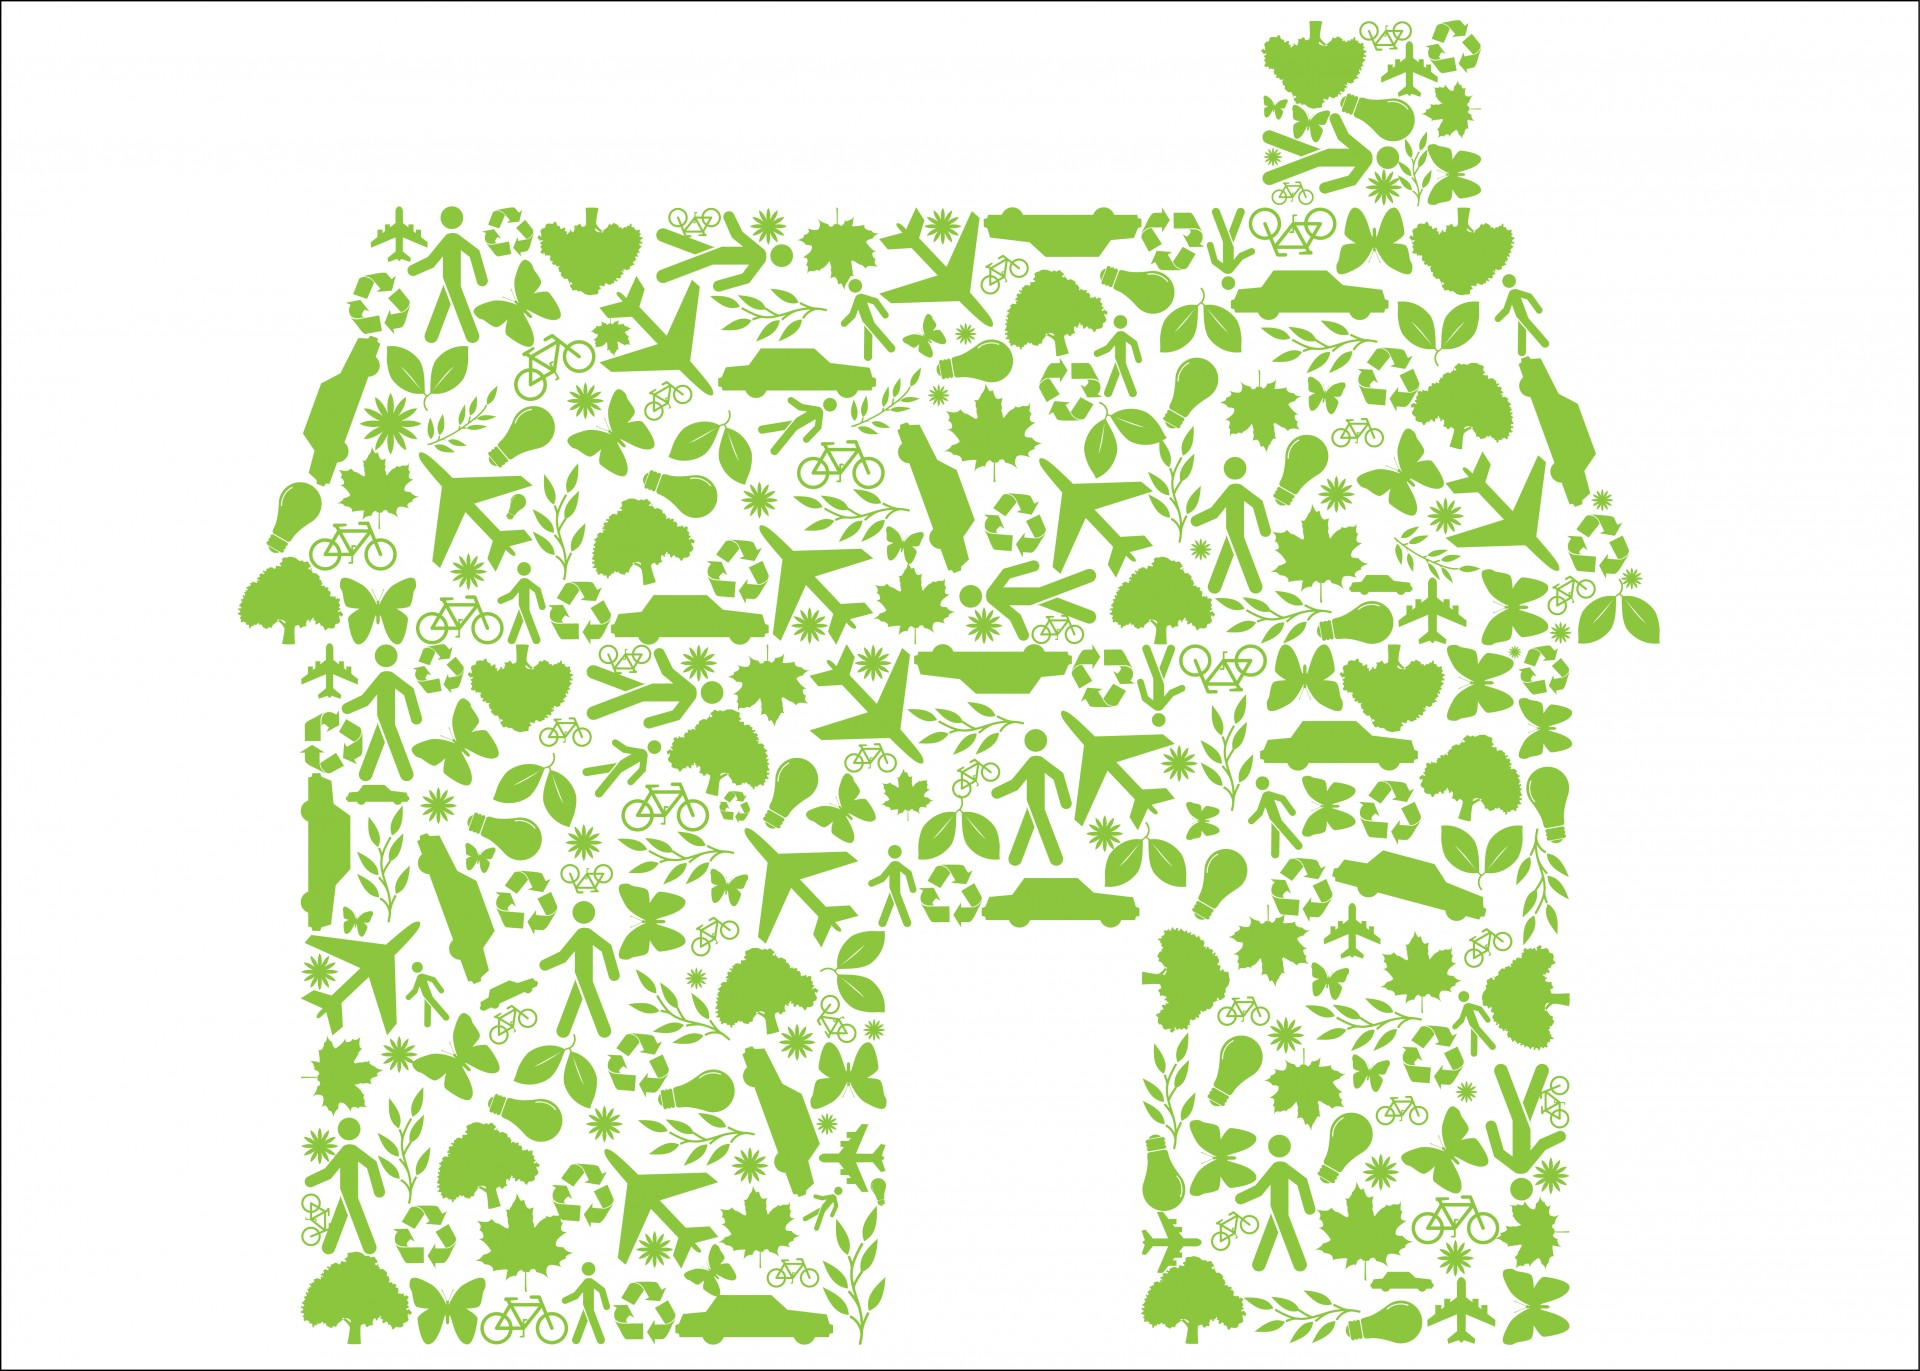 green-energy-eco-home